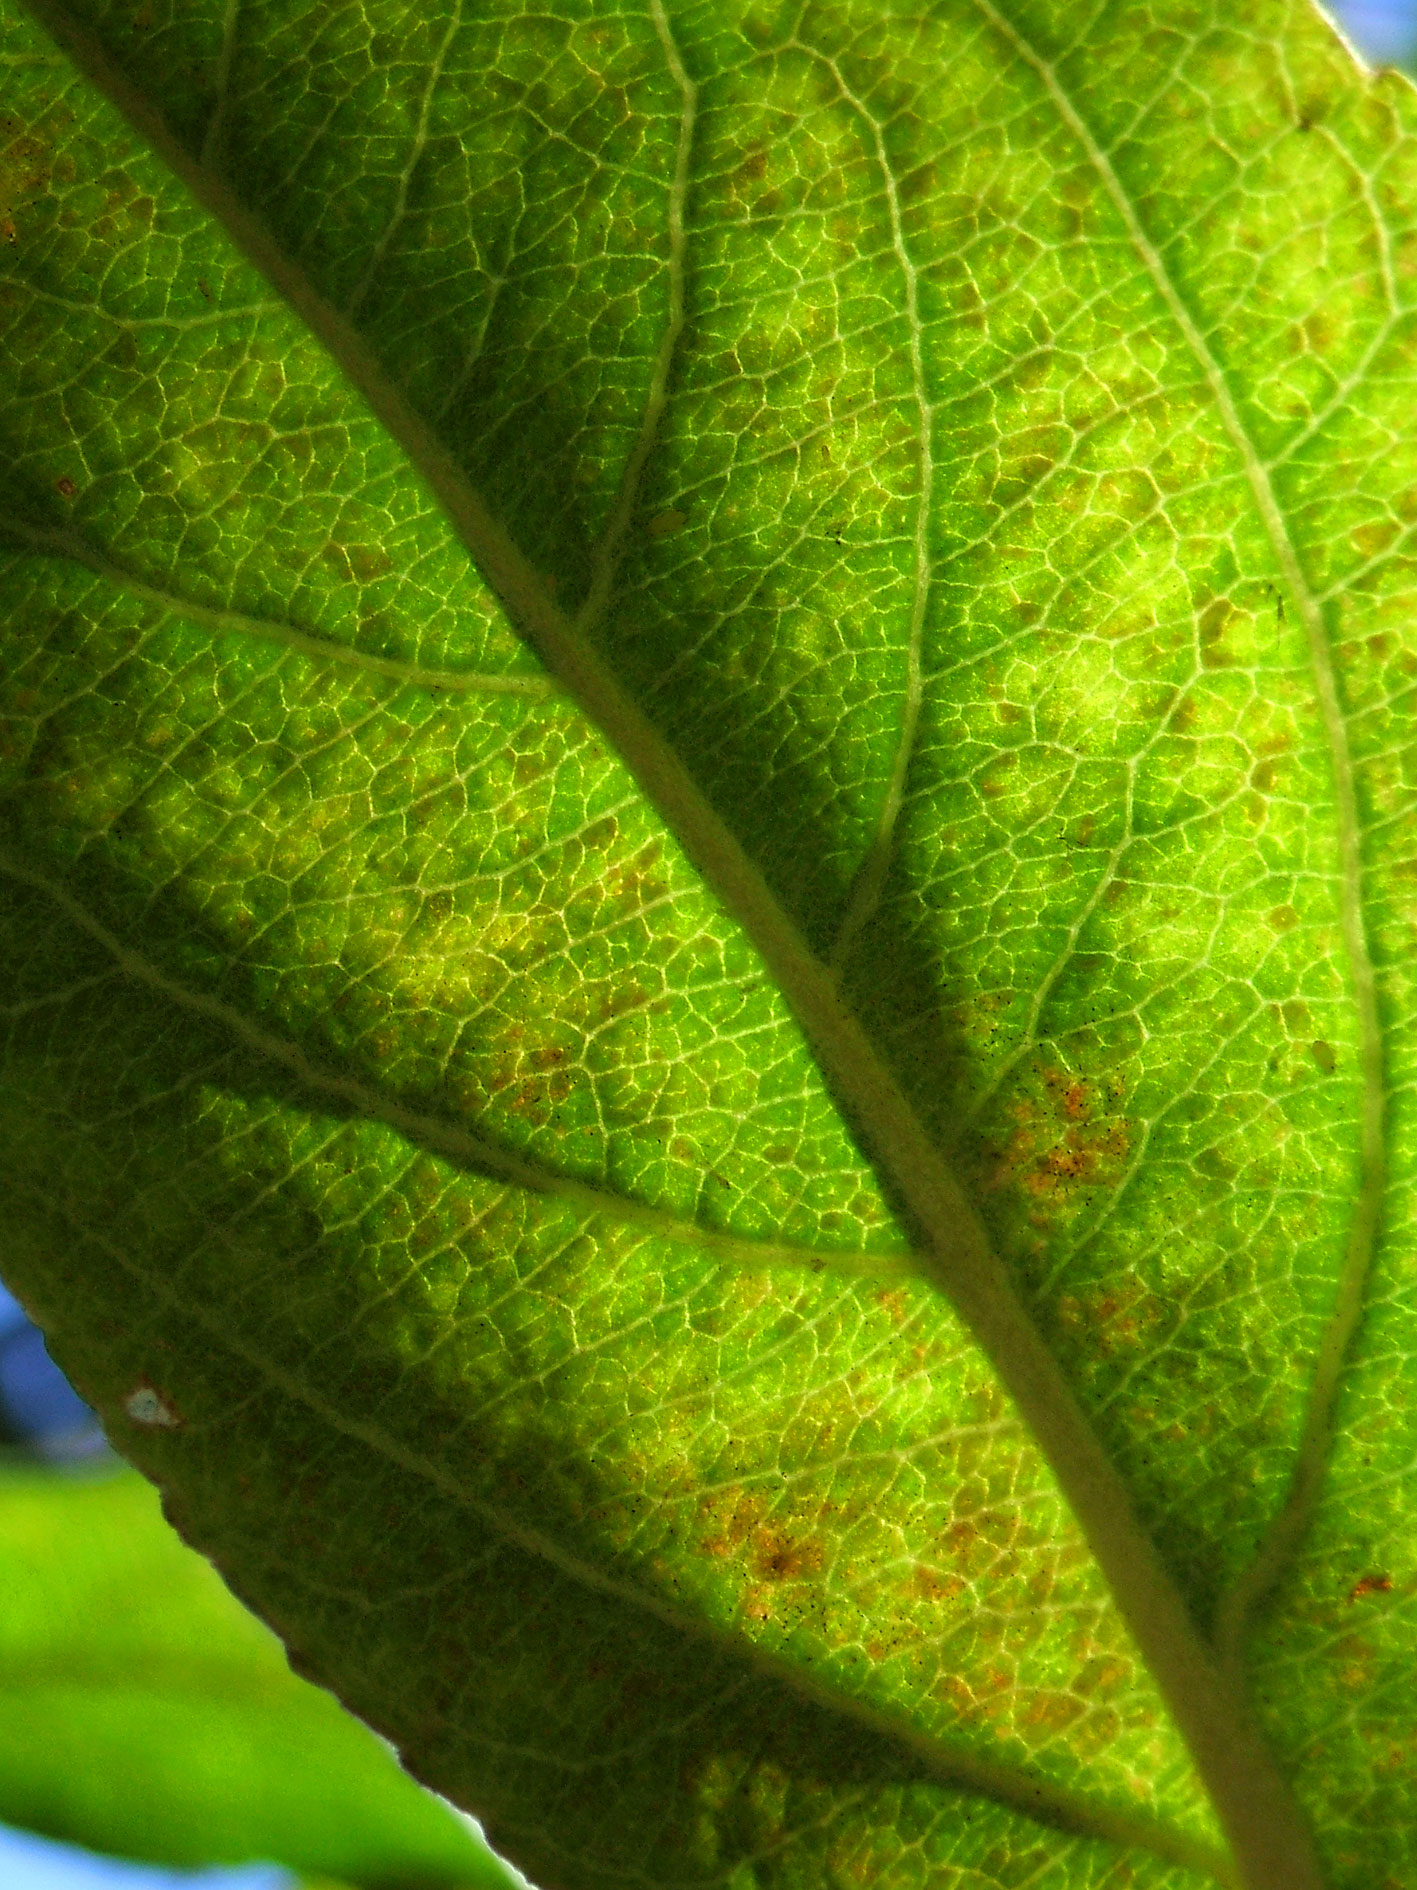 hoja verde web posada rural lindos suenos cantabria